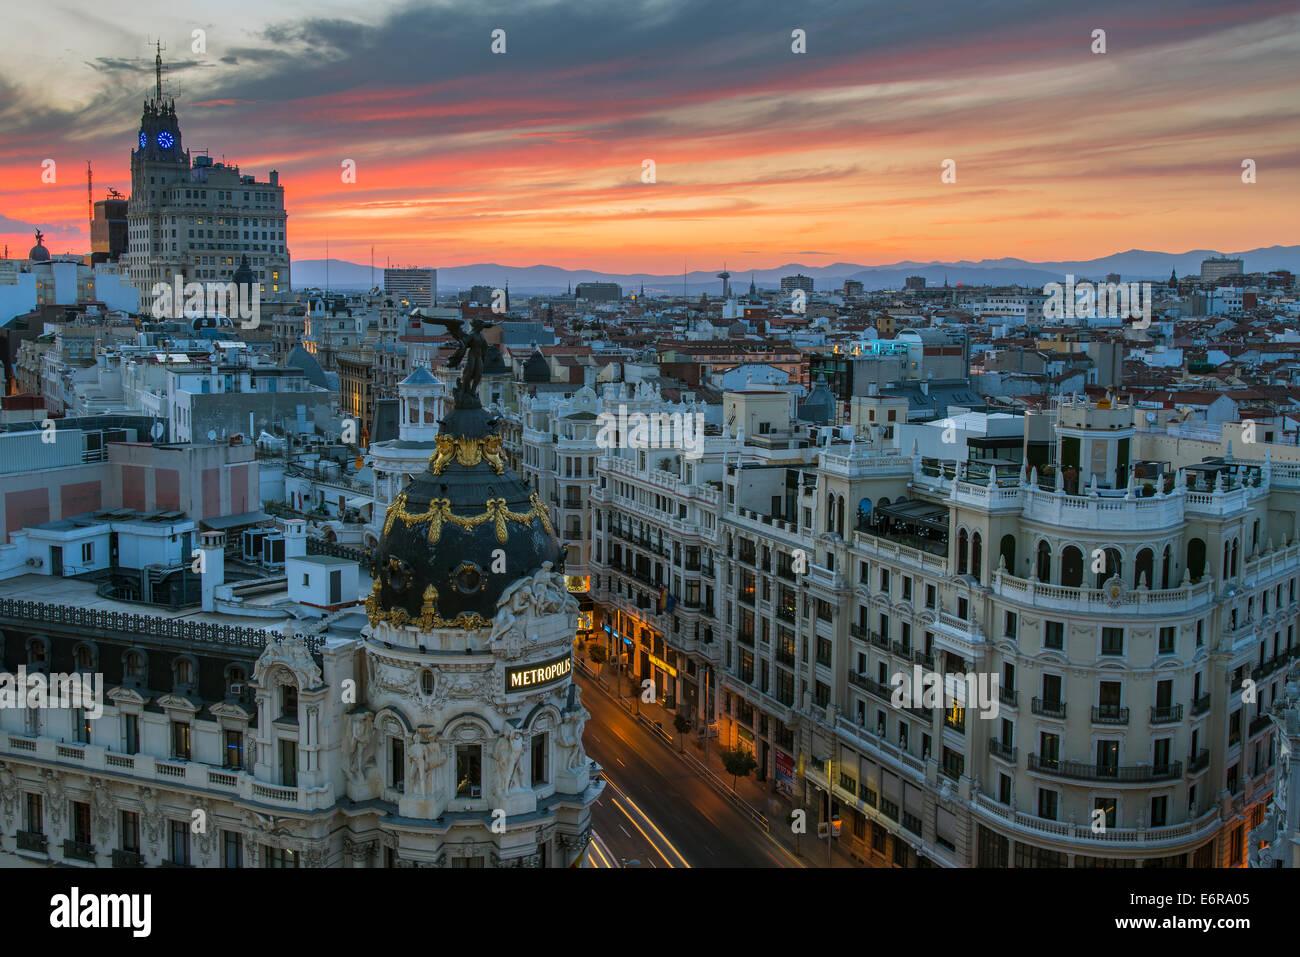 Skyline with Metropolis building and Gran Via street at sunset, Madrid, Comunidad de Madrid, Spain - Stock Image